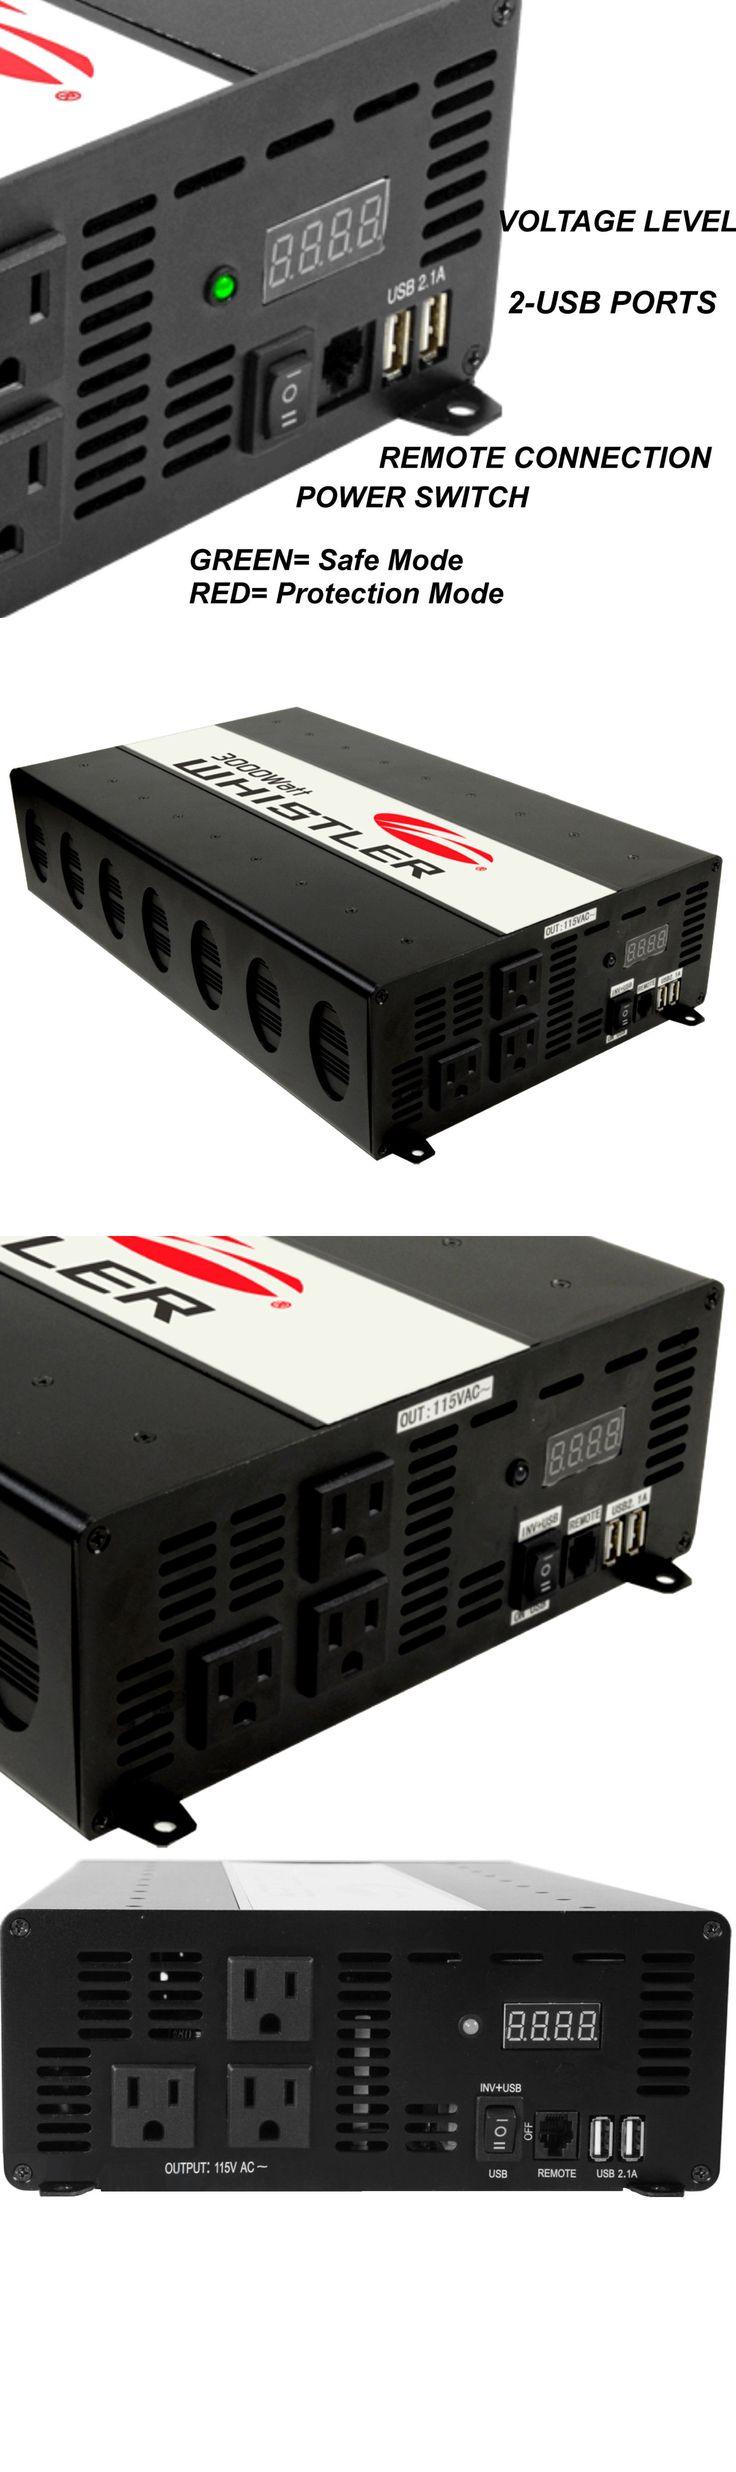 Aims 12 Volt 1250 Watt Dc To Ac Modified Inverter Off Grid Rv Car - Power inverters xp3000i whistler power inverter 12dc 120ac 3000 watt continuous 6000 watt peak buy